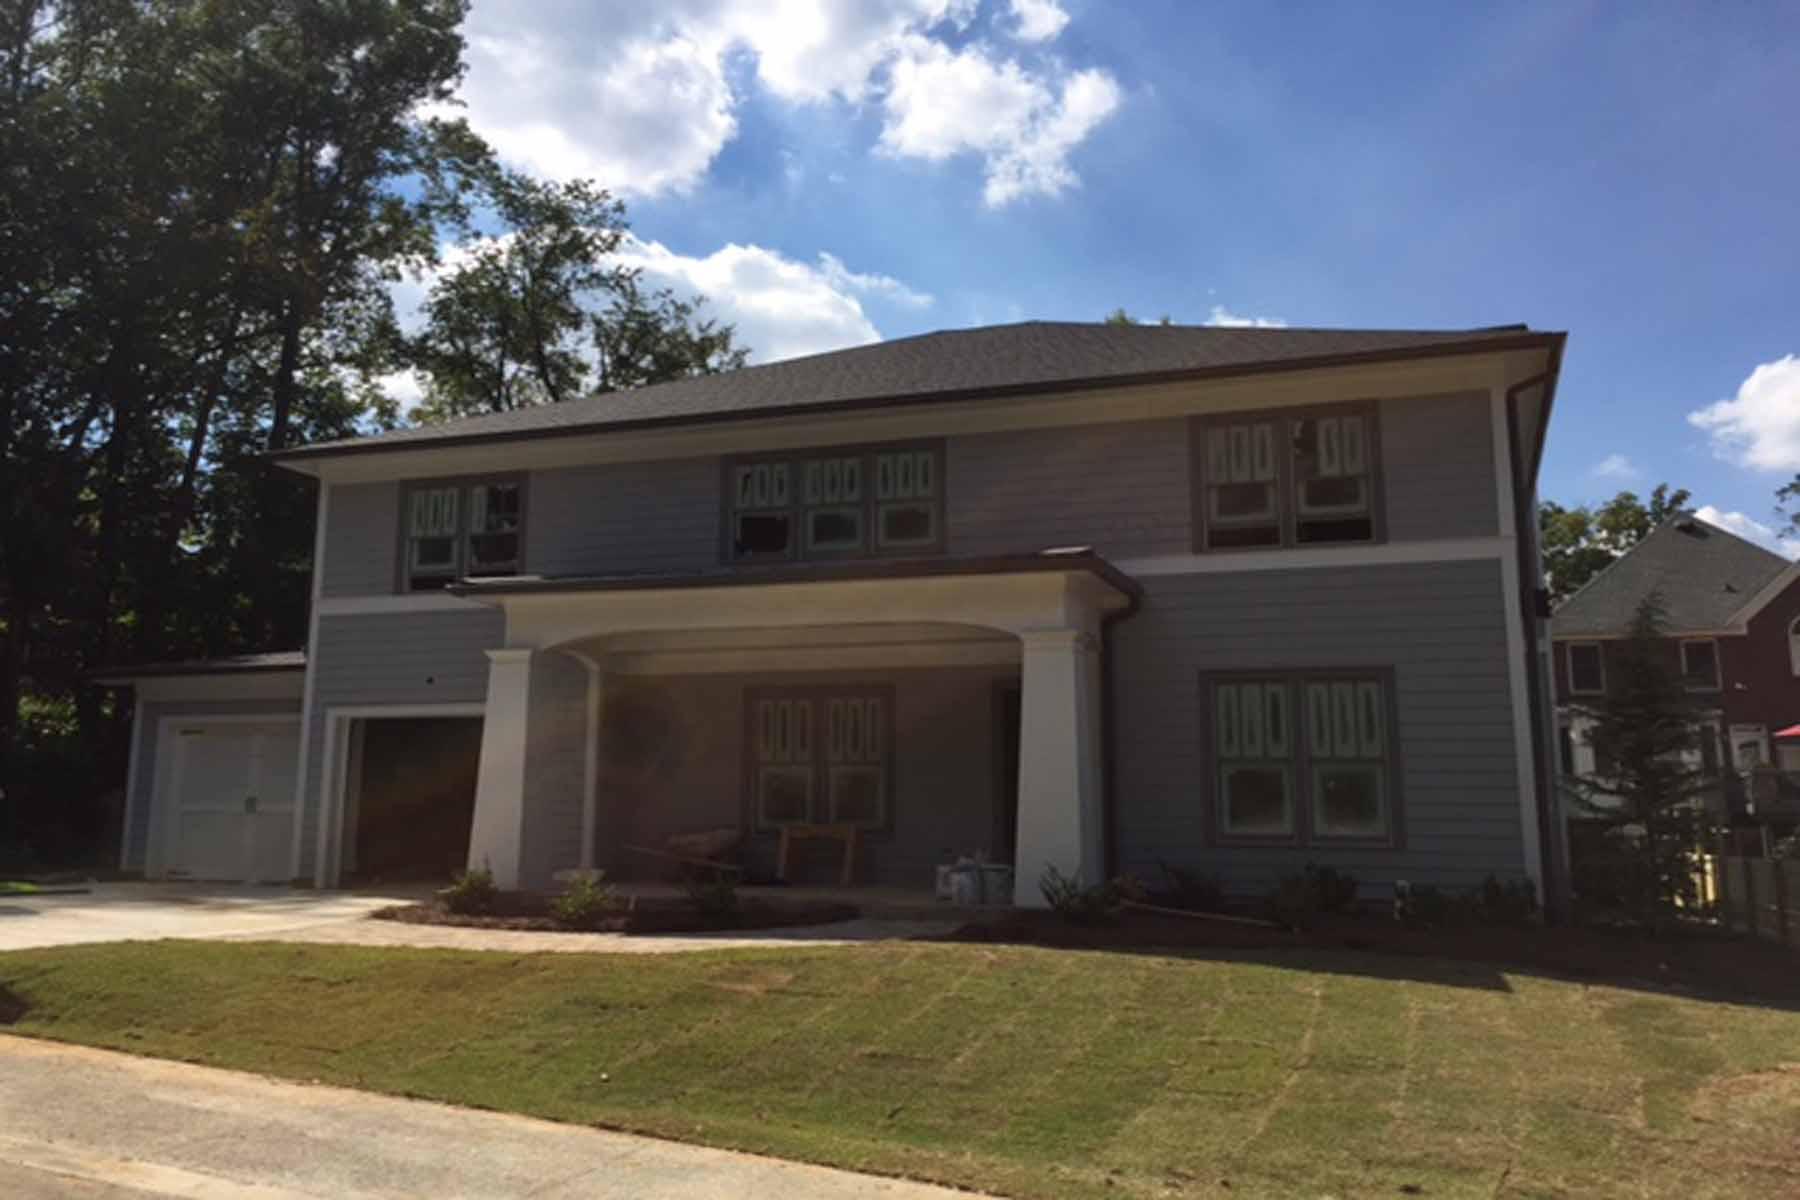 Casa para uma família para Venda às Spacious Two-Story Cul-de-Sac Home in Sheridan Estates 1185 Sheridan Road NE Lot 2 Atlanta, Geórgia, 30324 Estados Unidos